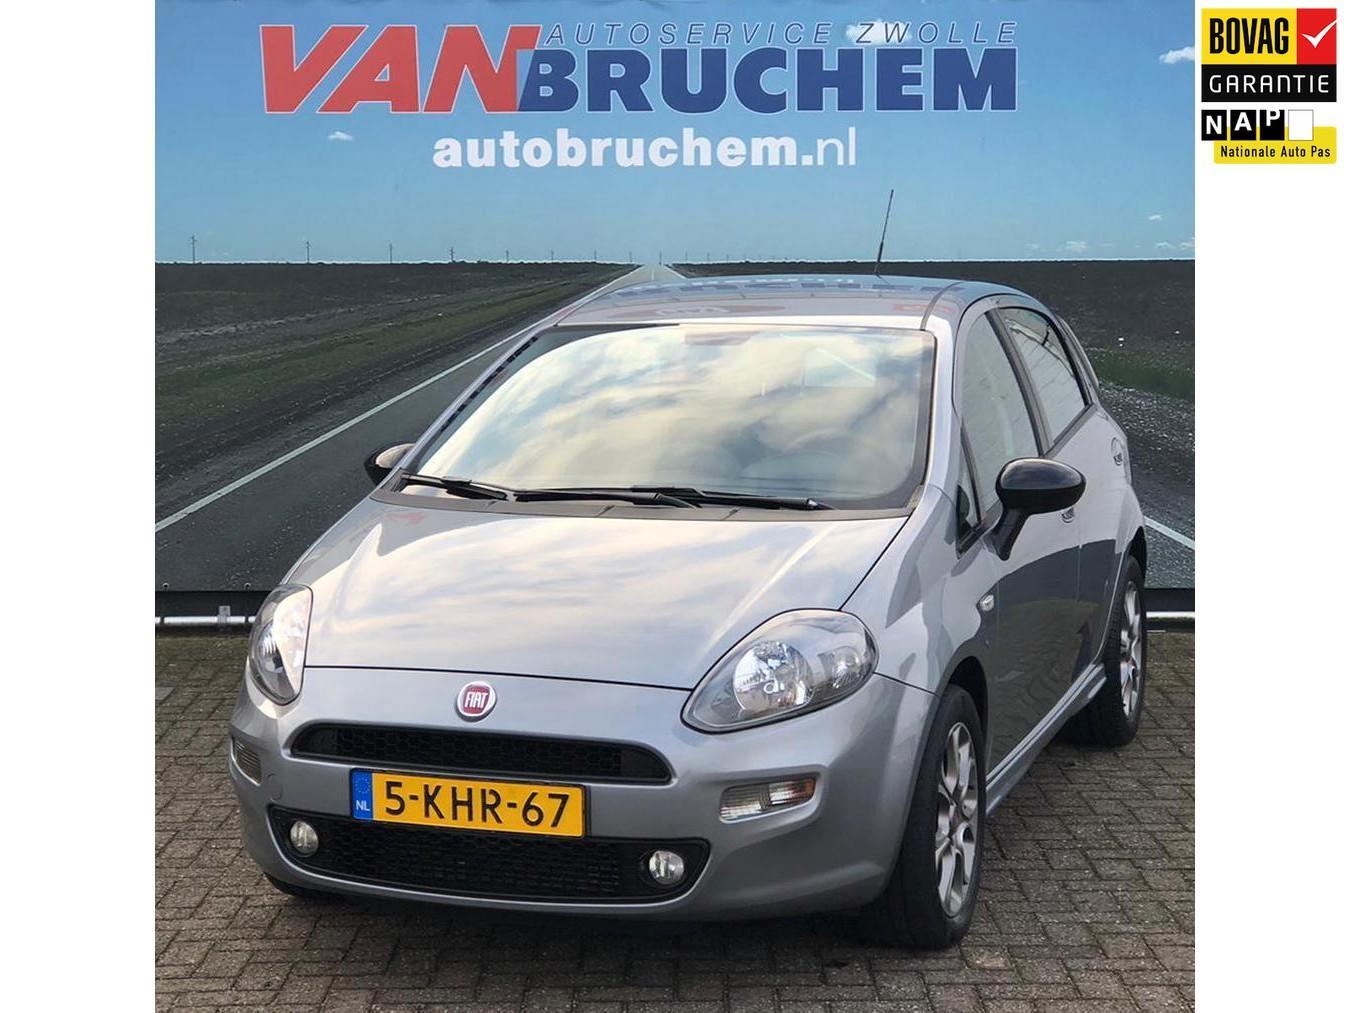 Fiat Punto evo 0.9 twinair easy /airco /lm velgen/ dealeronderhouden/ sportief en zuinig